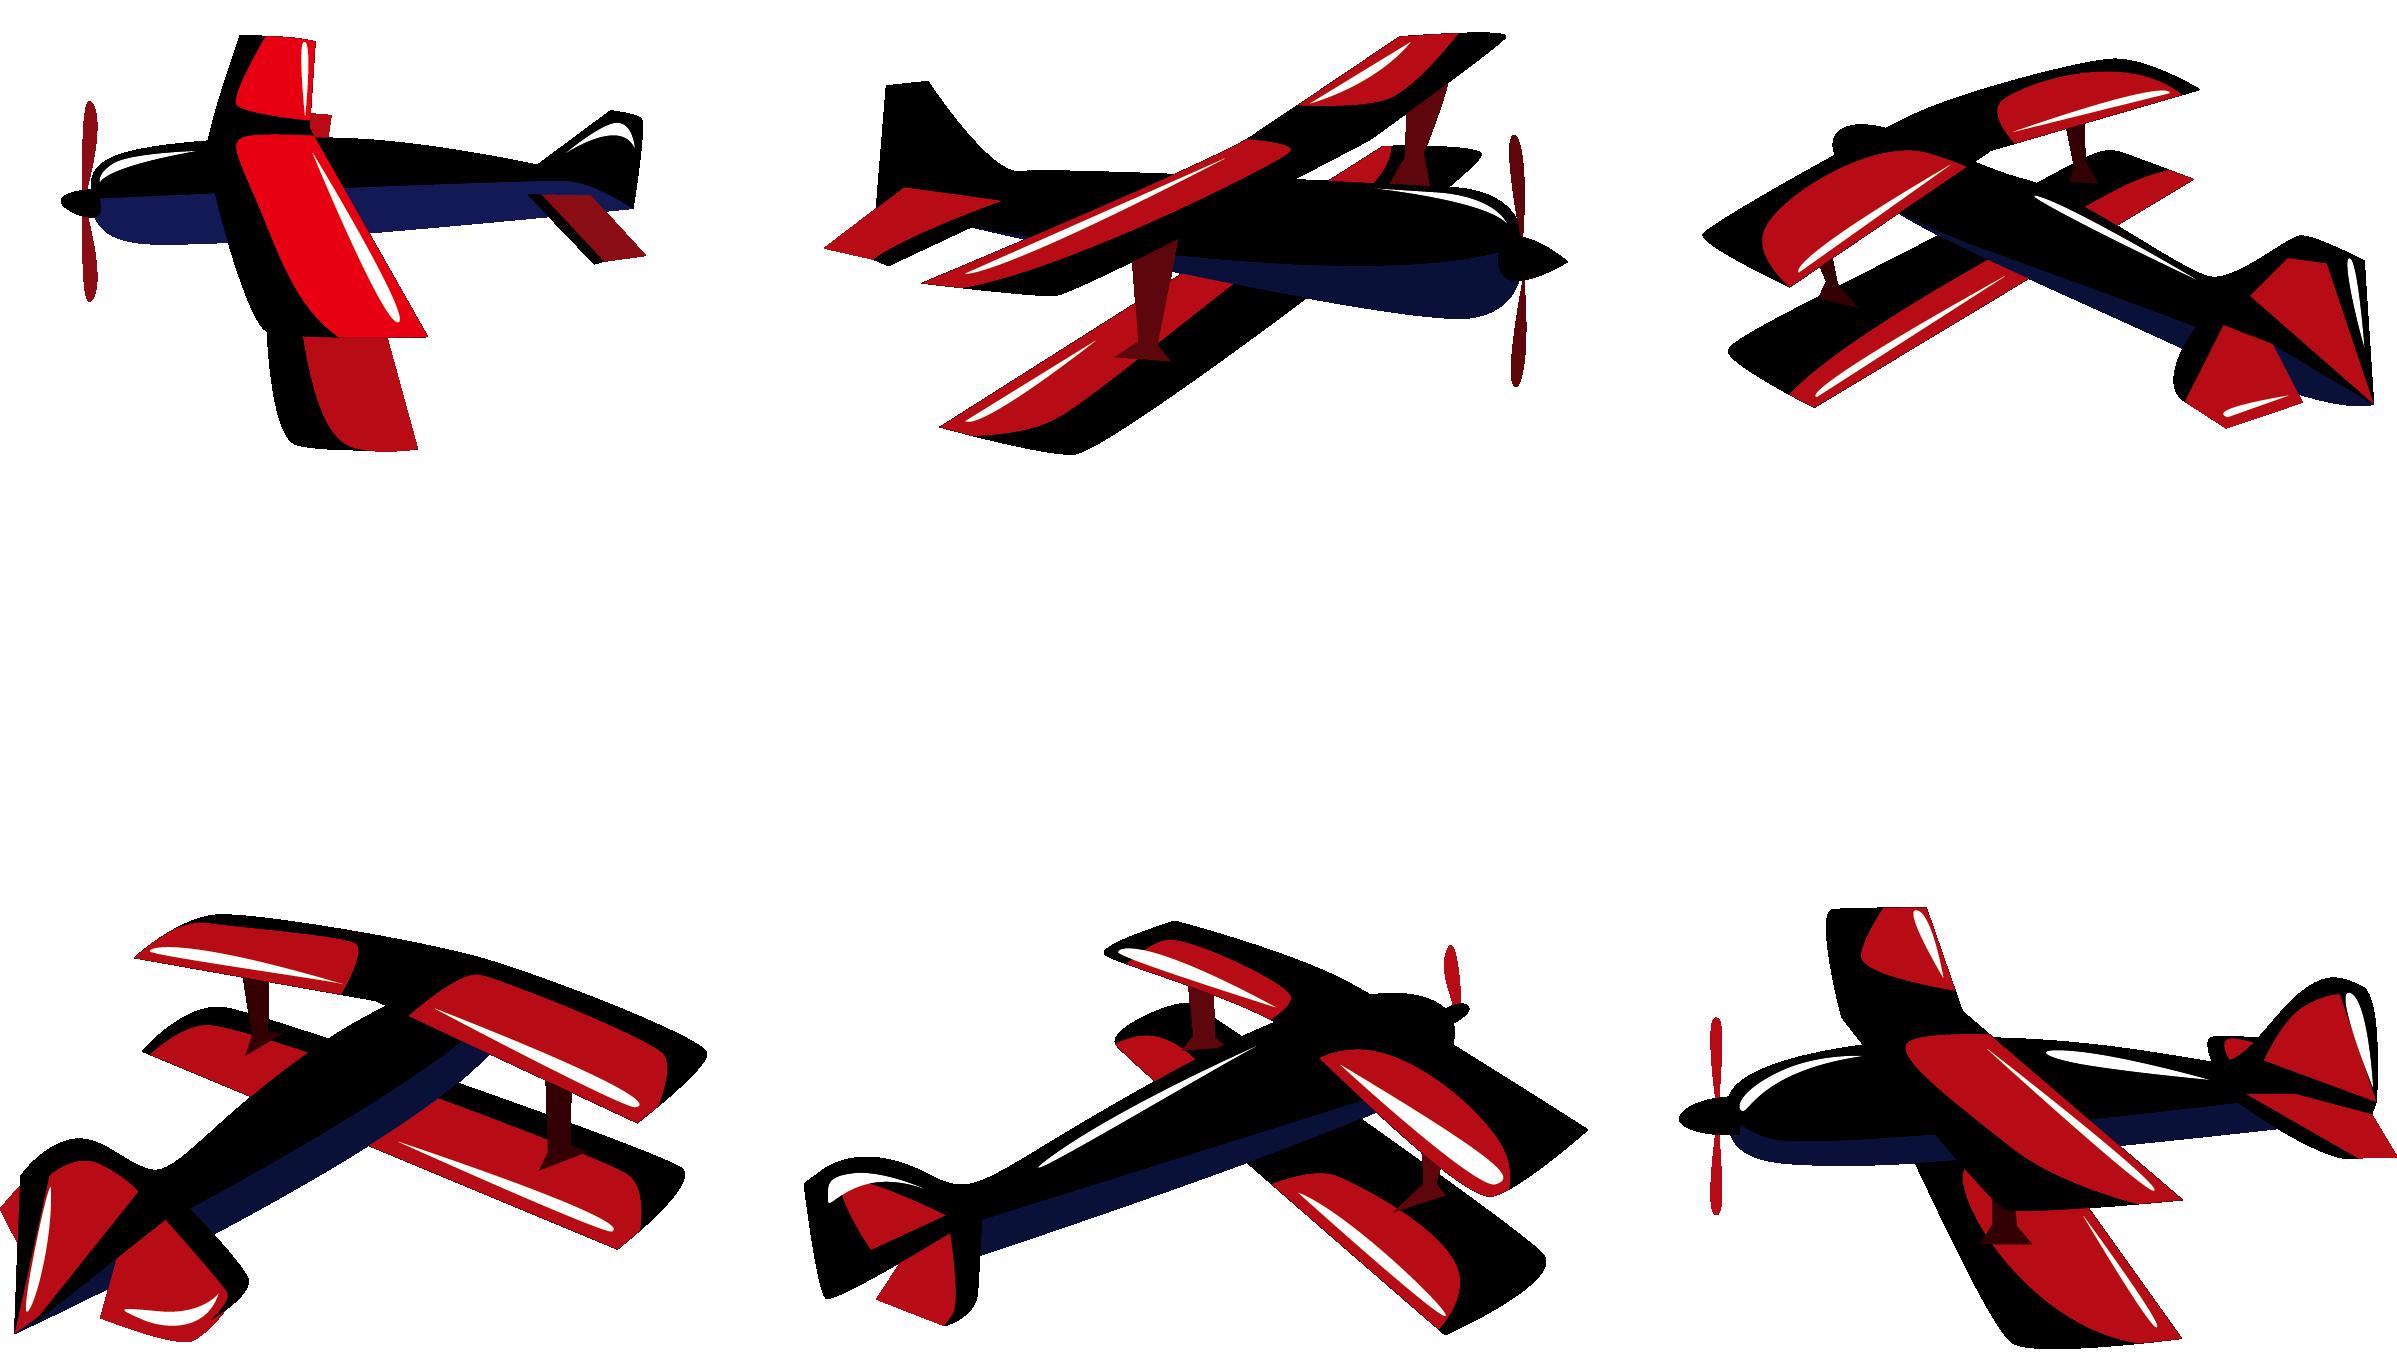 2397x1355 Airplane Logo Biplane Silhouette